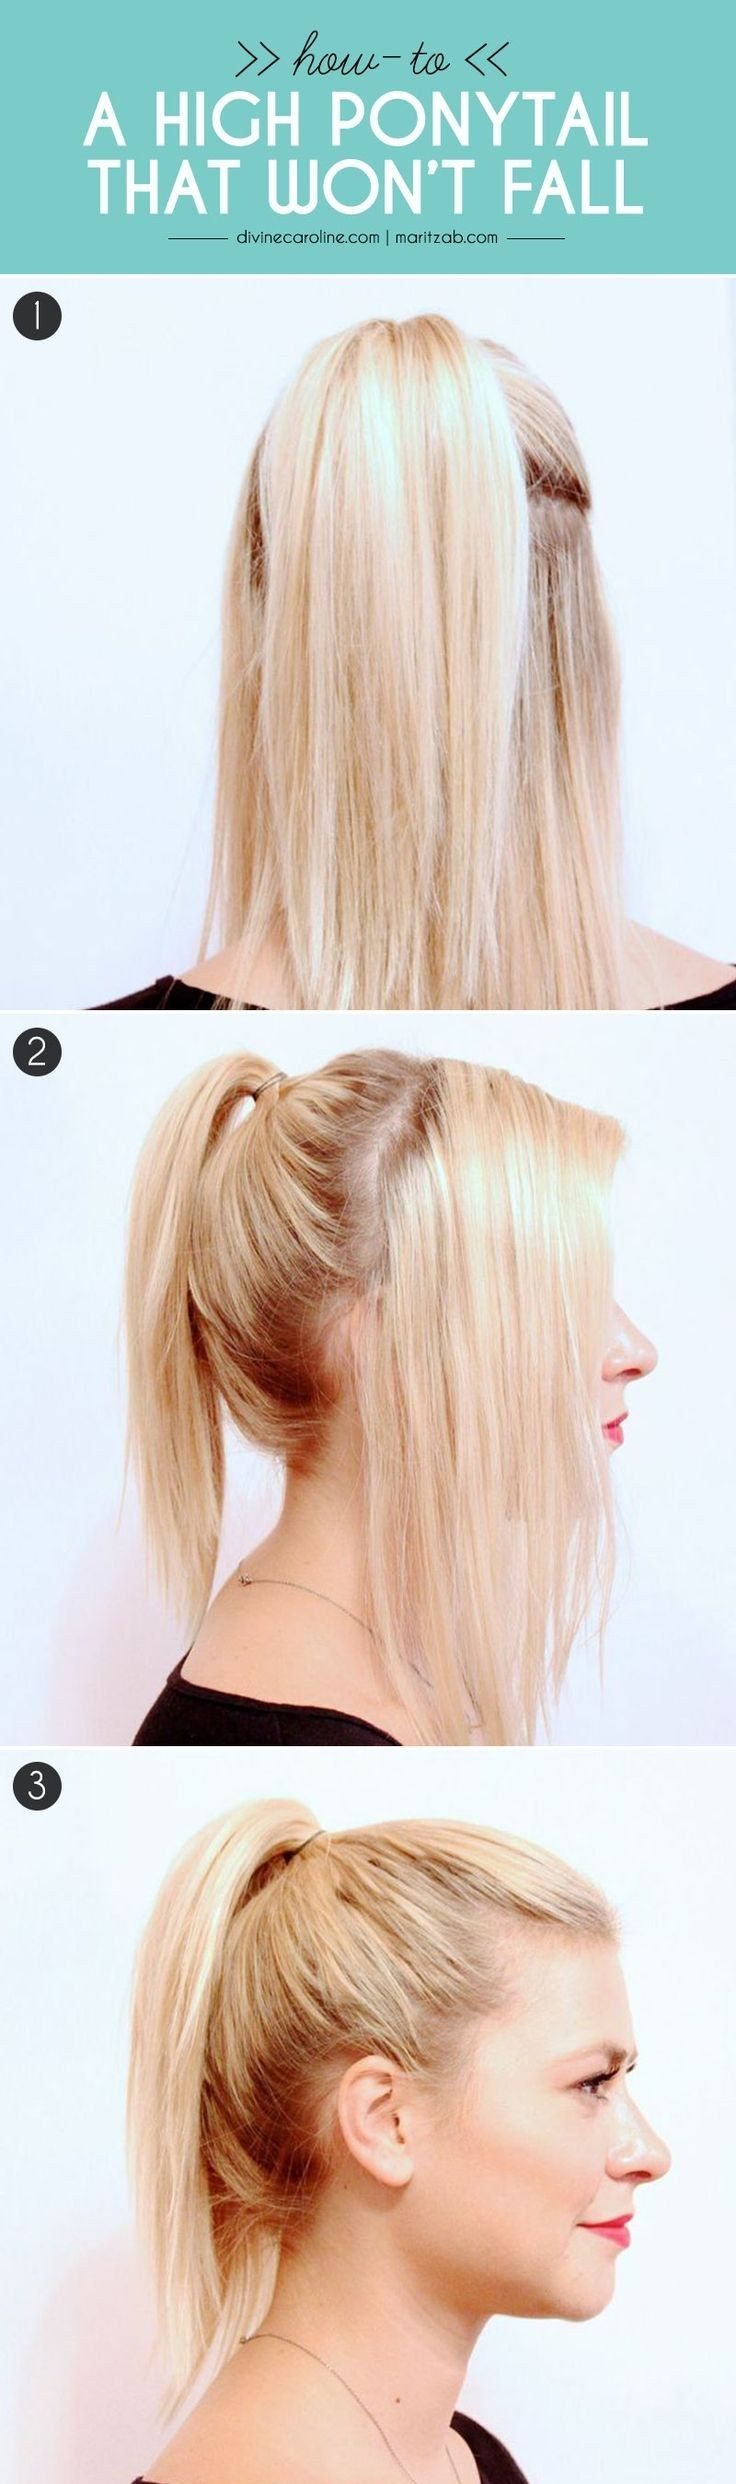 <b>Now you, too, can get that Serena Van Der Woodsen ponytail you've always dreamed of.</b>